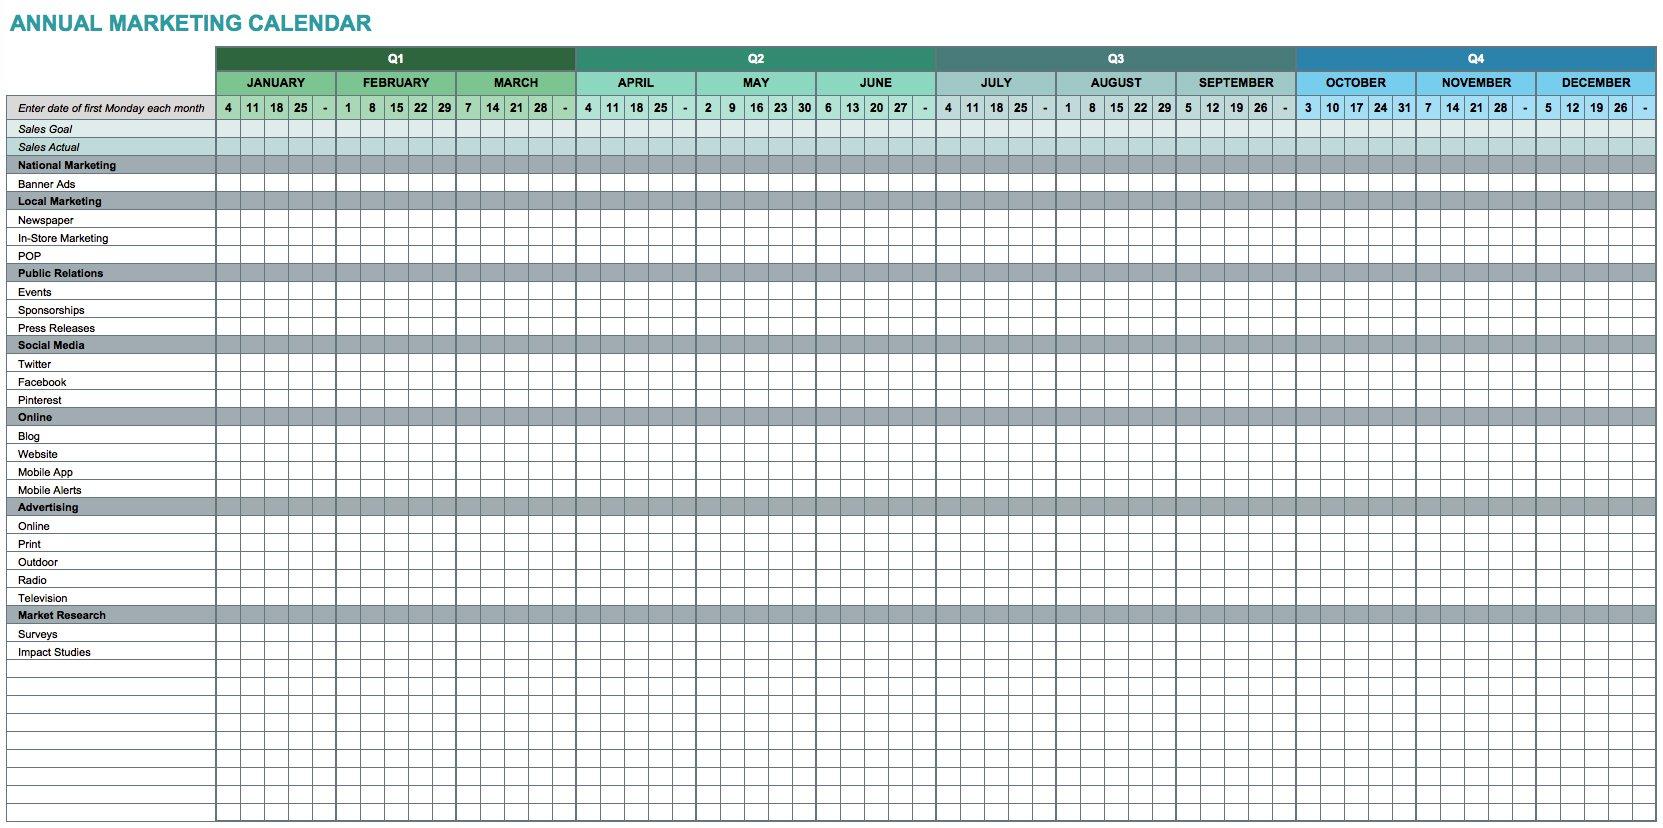 9 Free Marketing Calendar Templates For Excel - Smartsheet inside Social Media Content Plan Excel Template Free